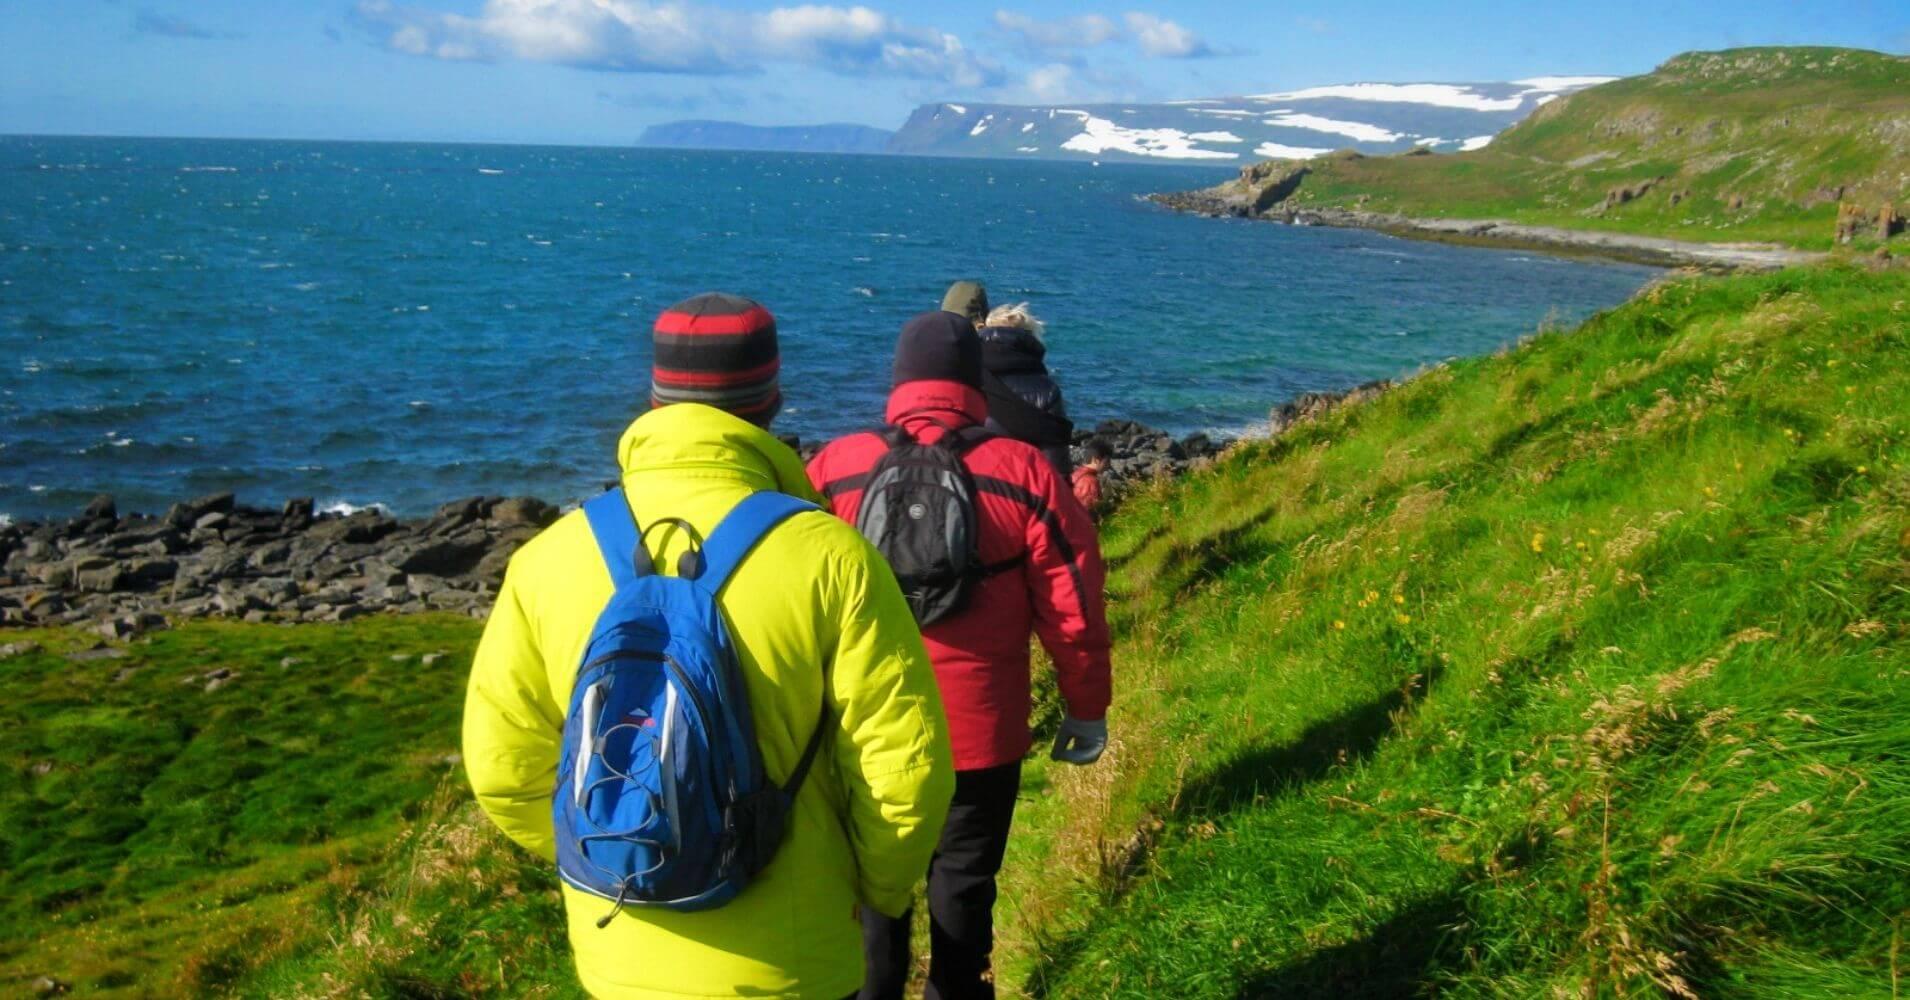 Ruta de Senderismo. Ísafjörður. Vestfirðir en Islandia.